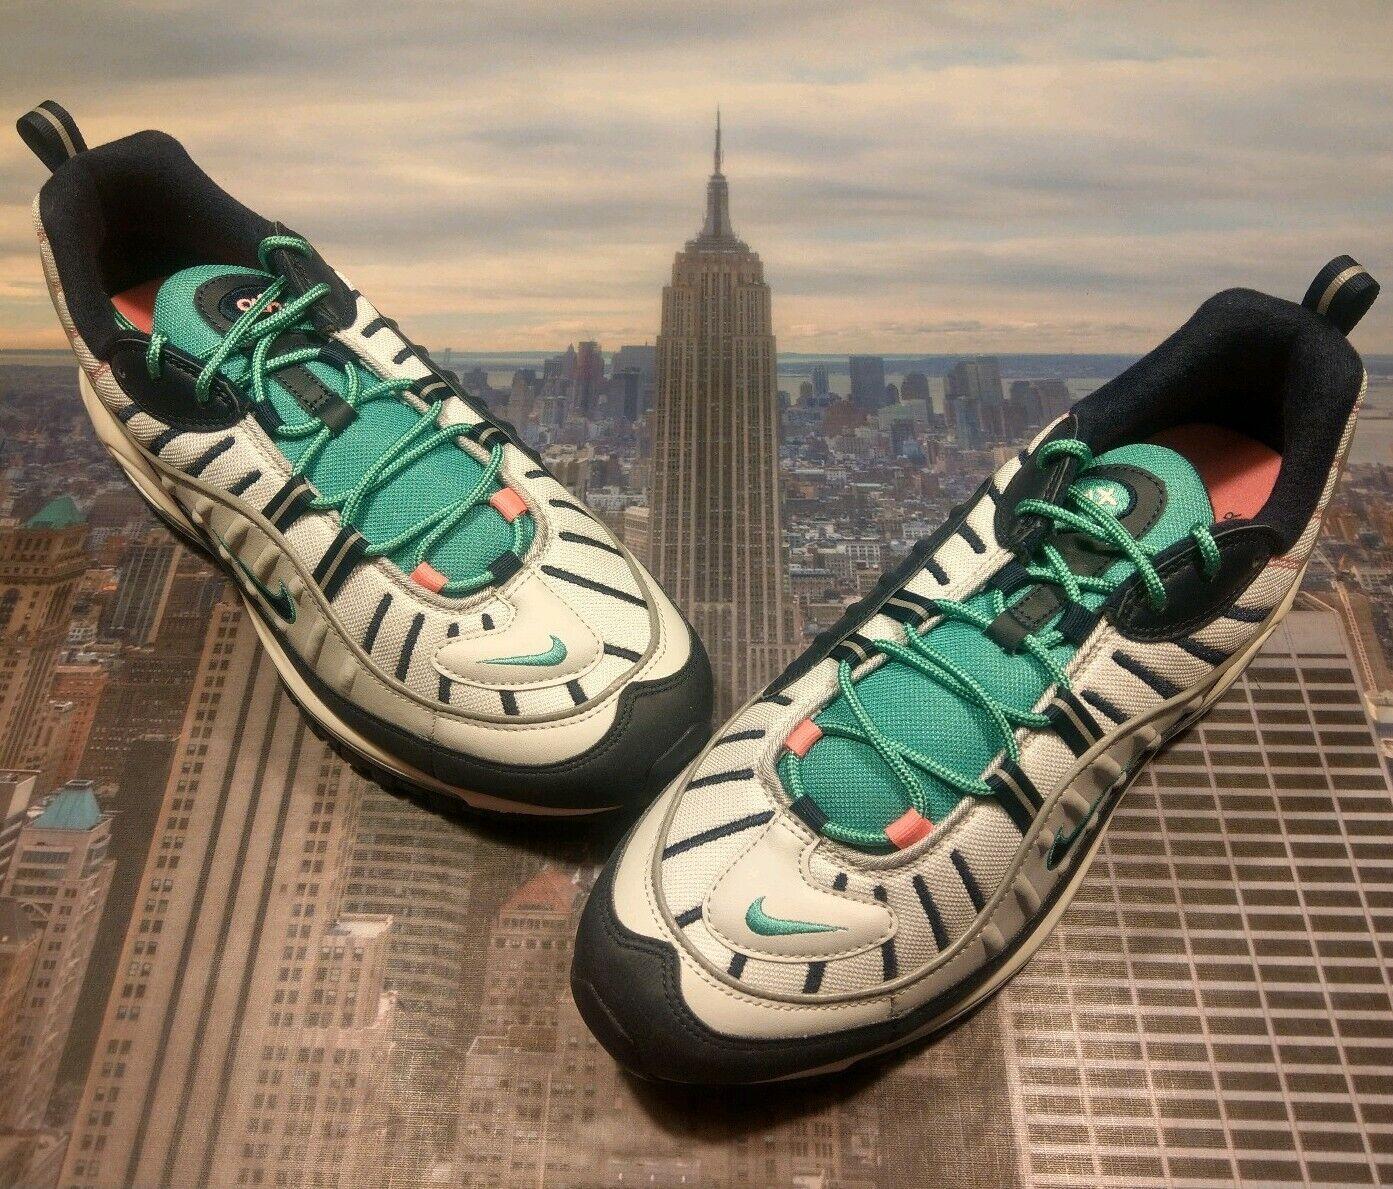 Nike Air Max 98 South Beach Tidal Wave Pure Platinum Mens Size 14 640744 005 New